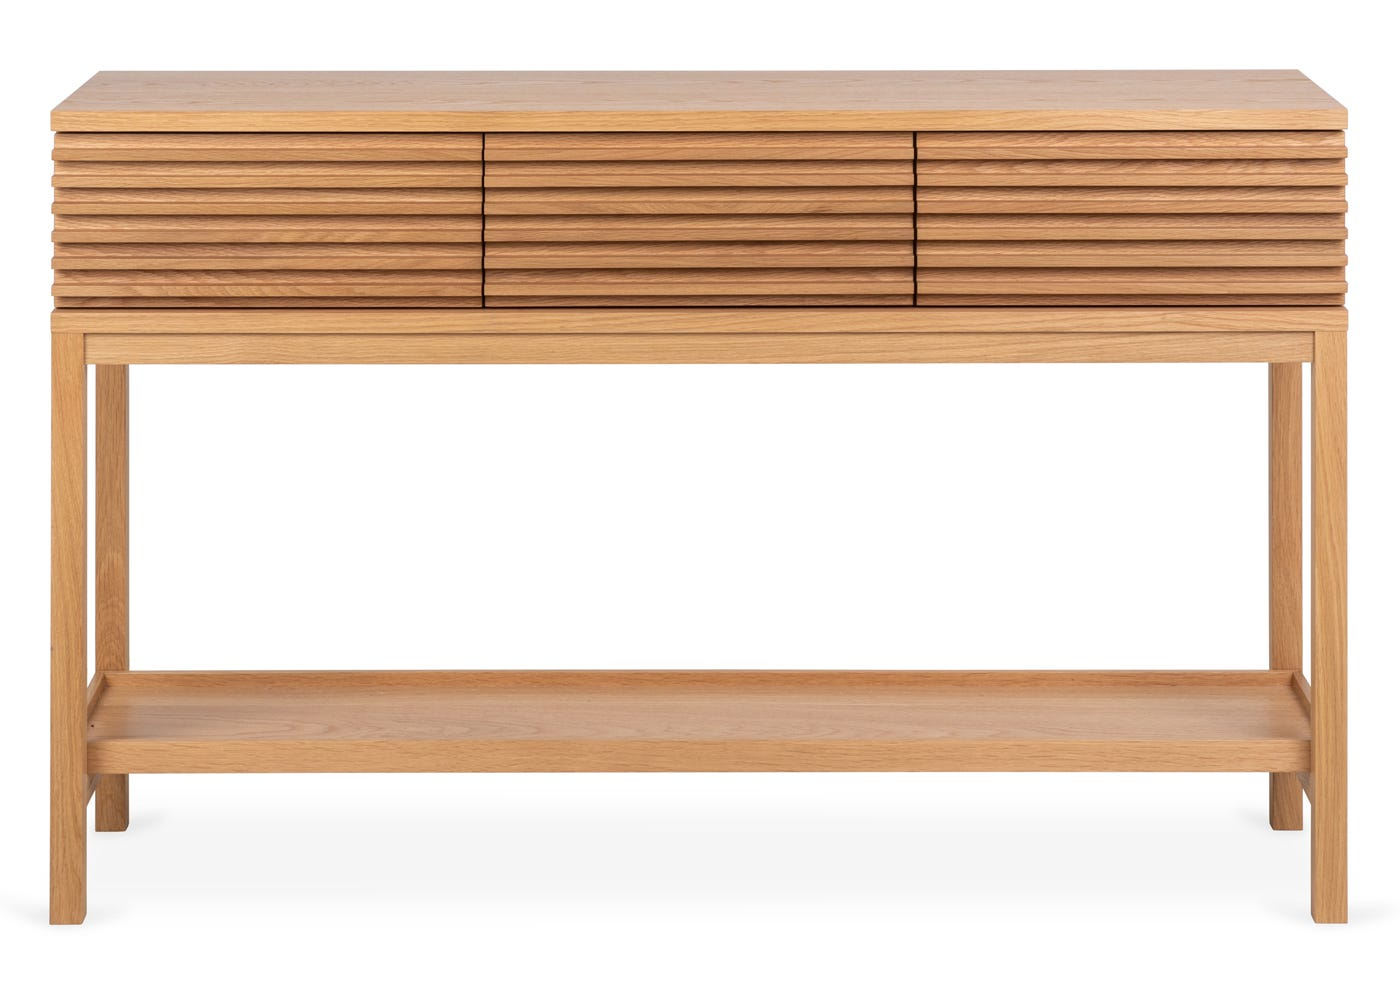 As shown: Verona oak console table - Side profile. - Front profile.